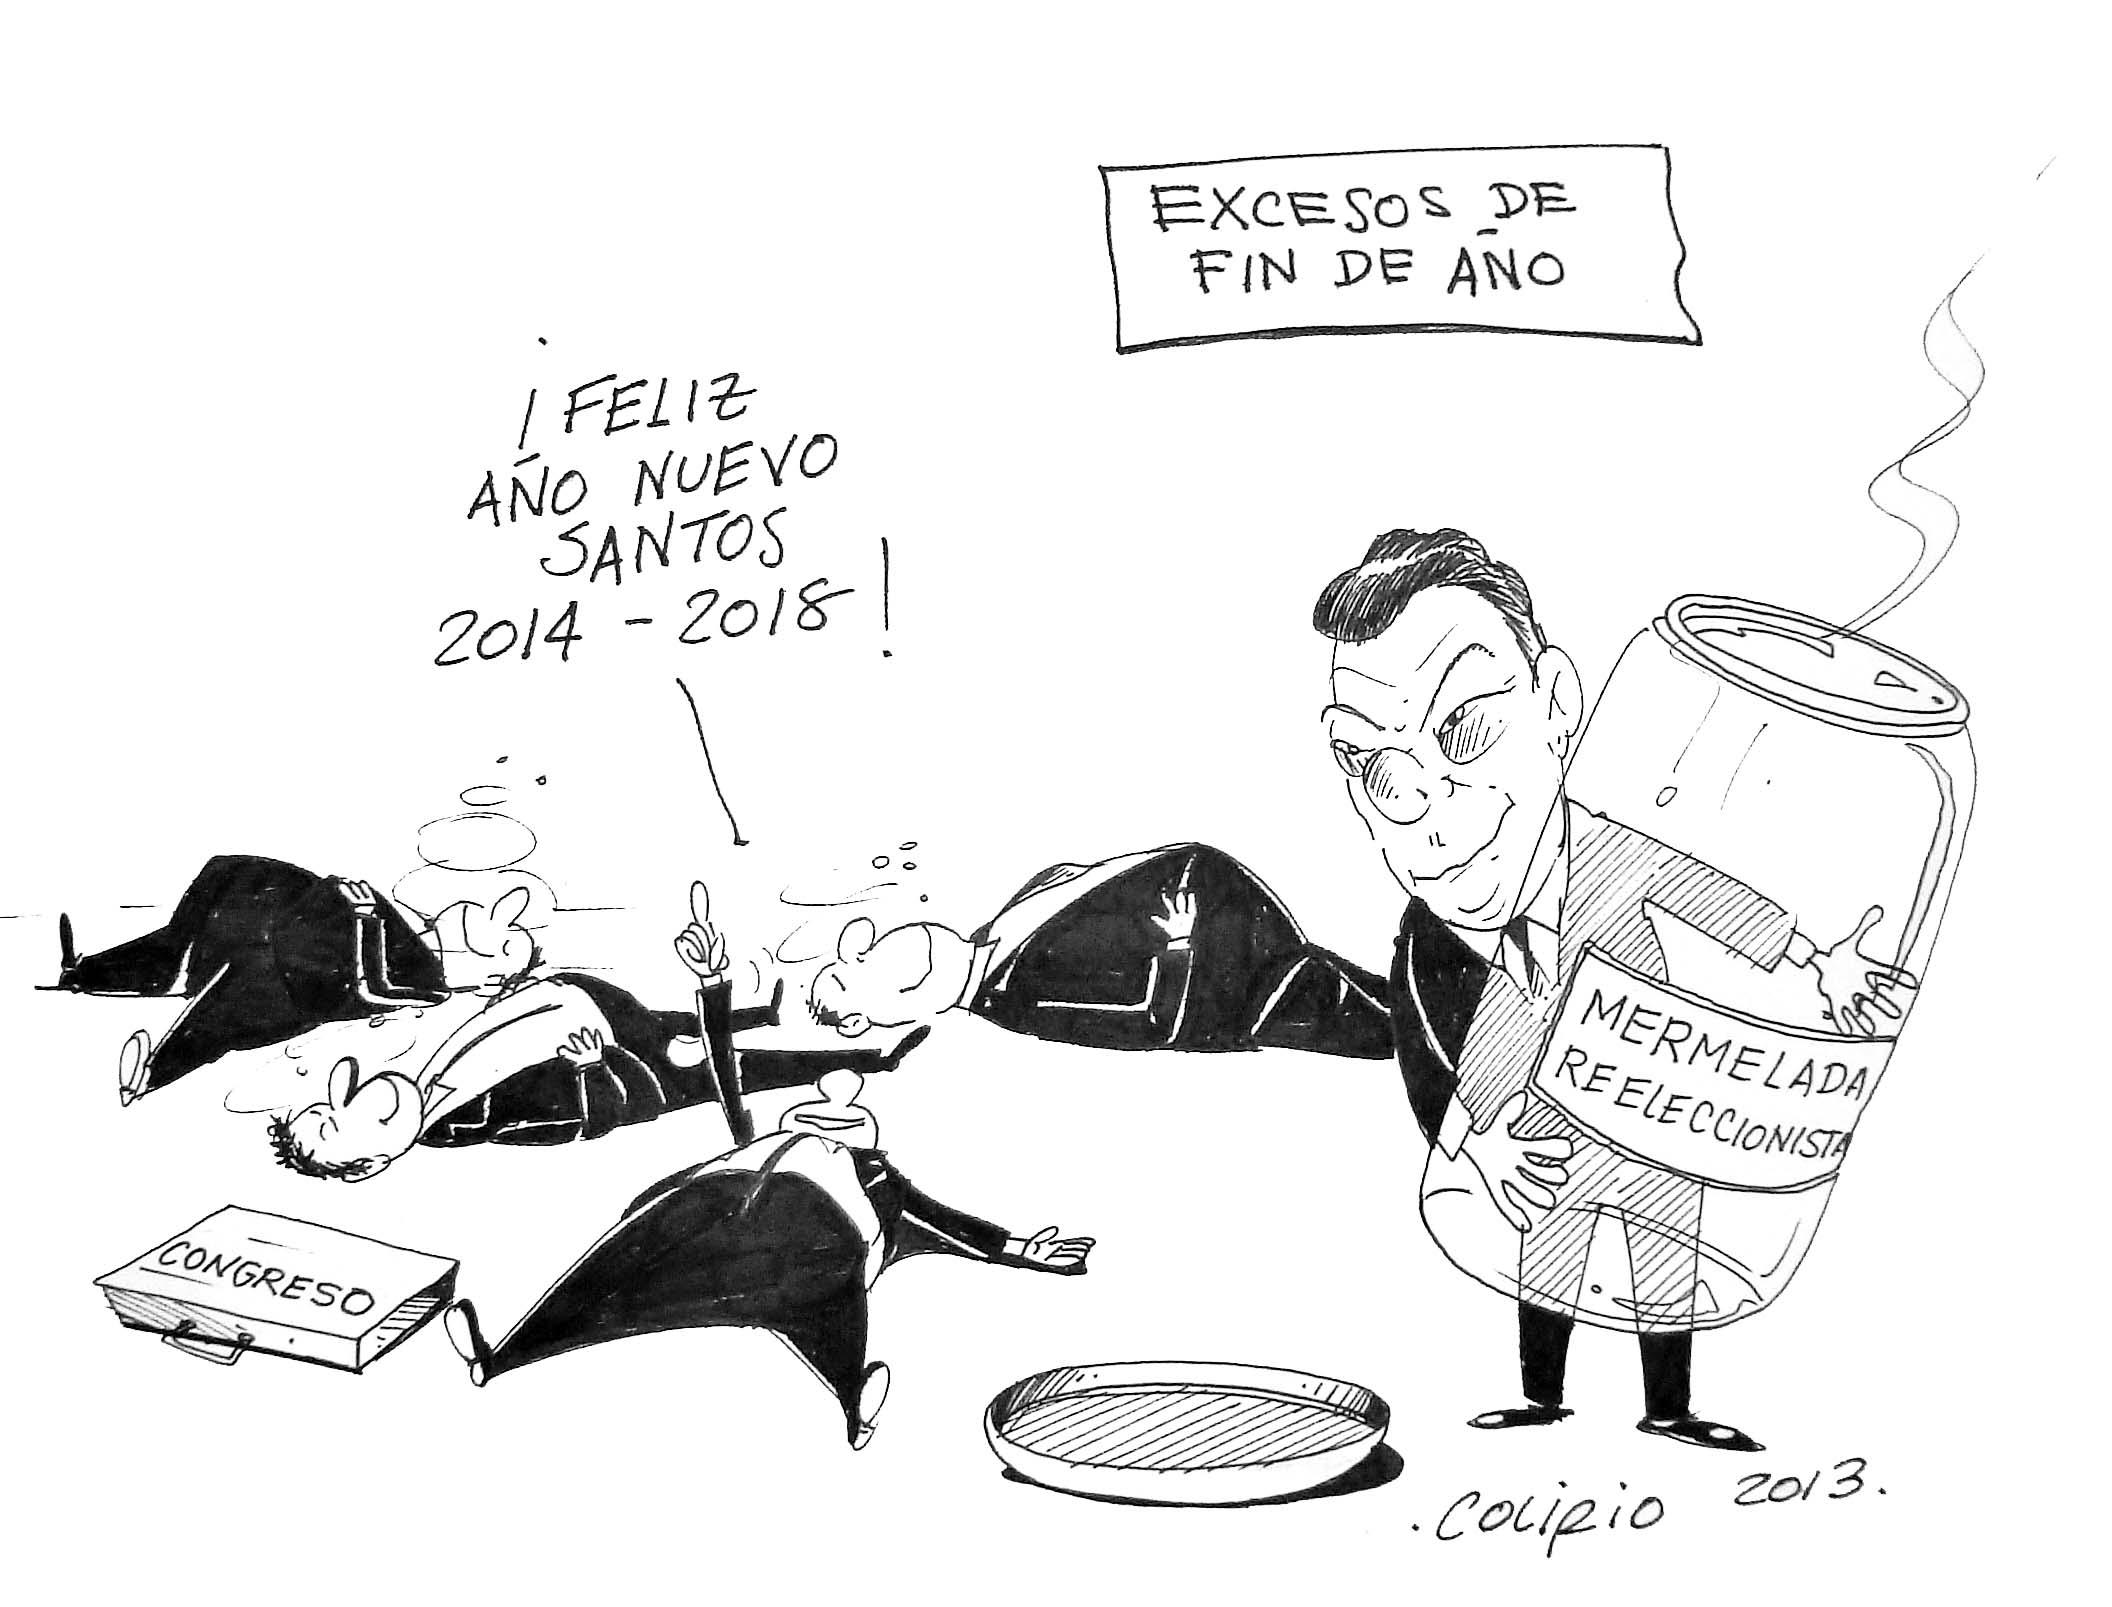 carica sabado 28 de dici de 2013